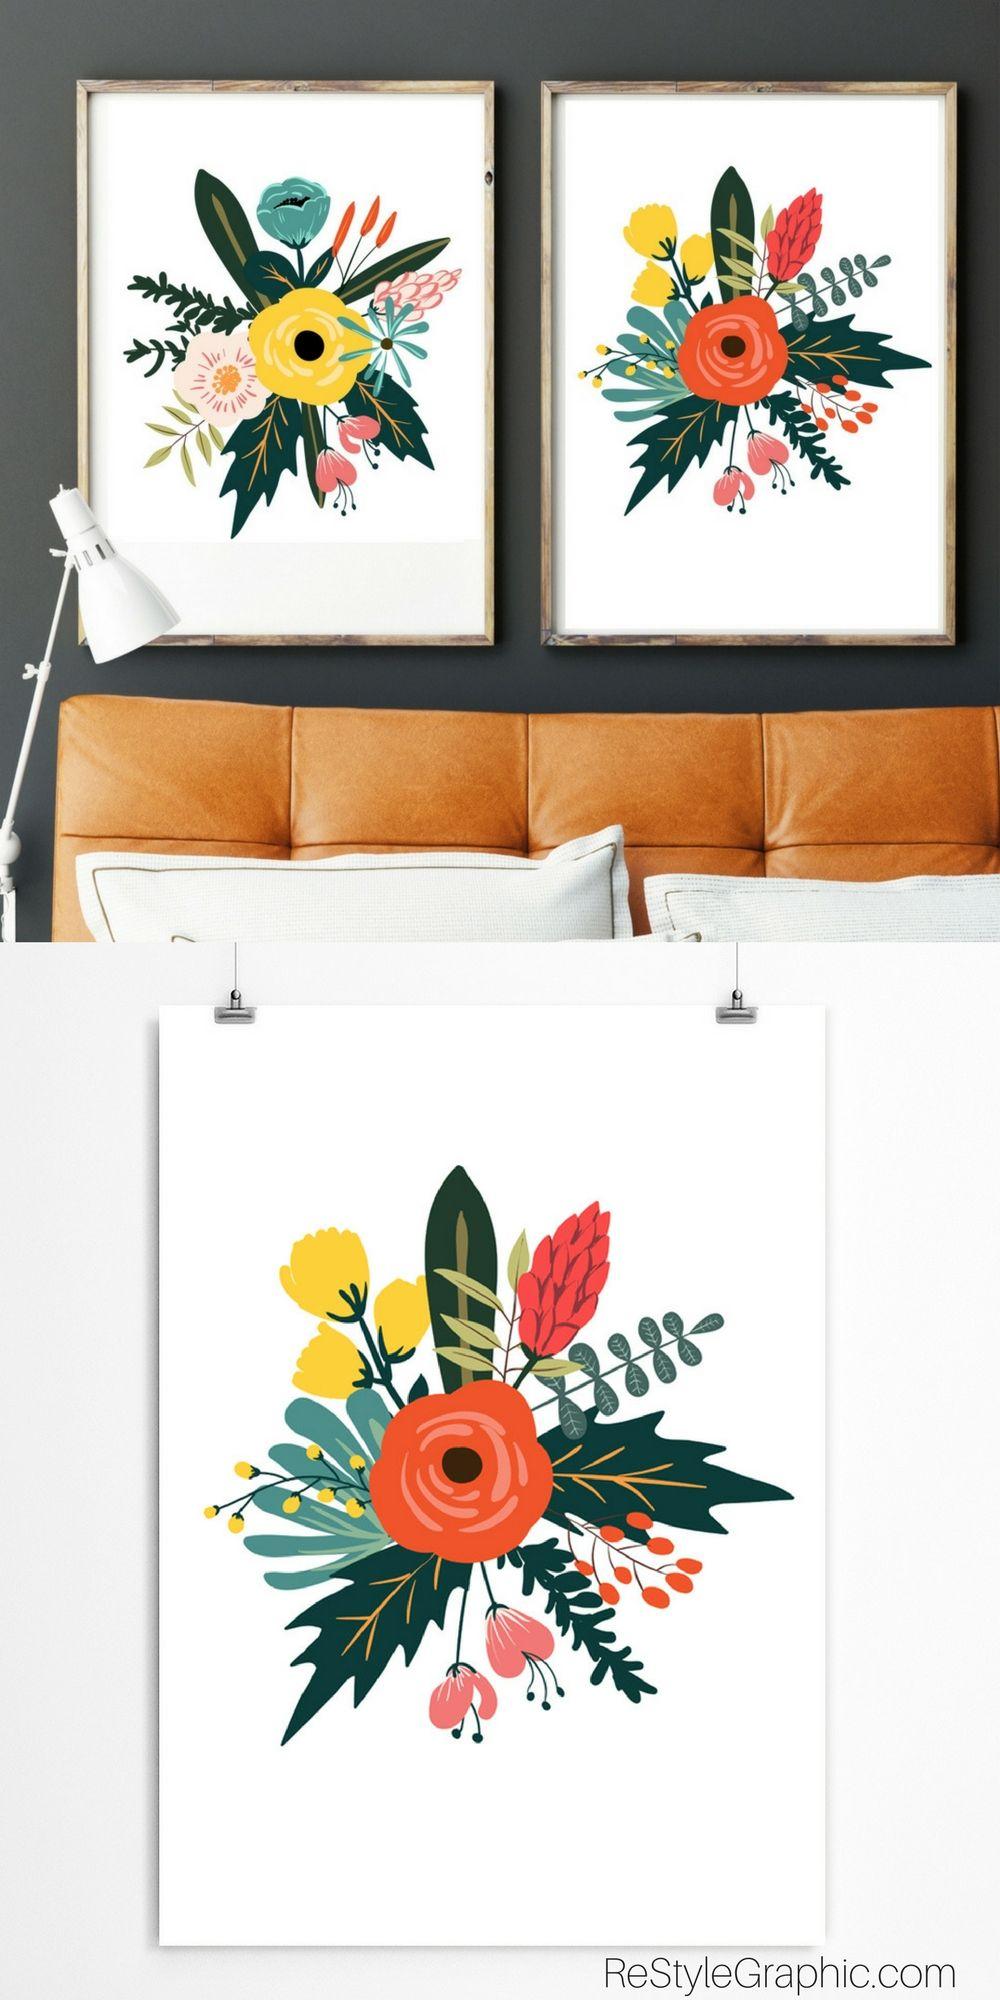 Floral Wall Artwork Restylegraphic Kids Art Prints Floral Prints Art Floral Wall Art